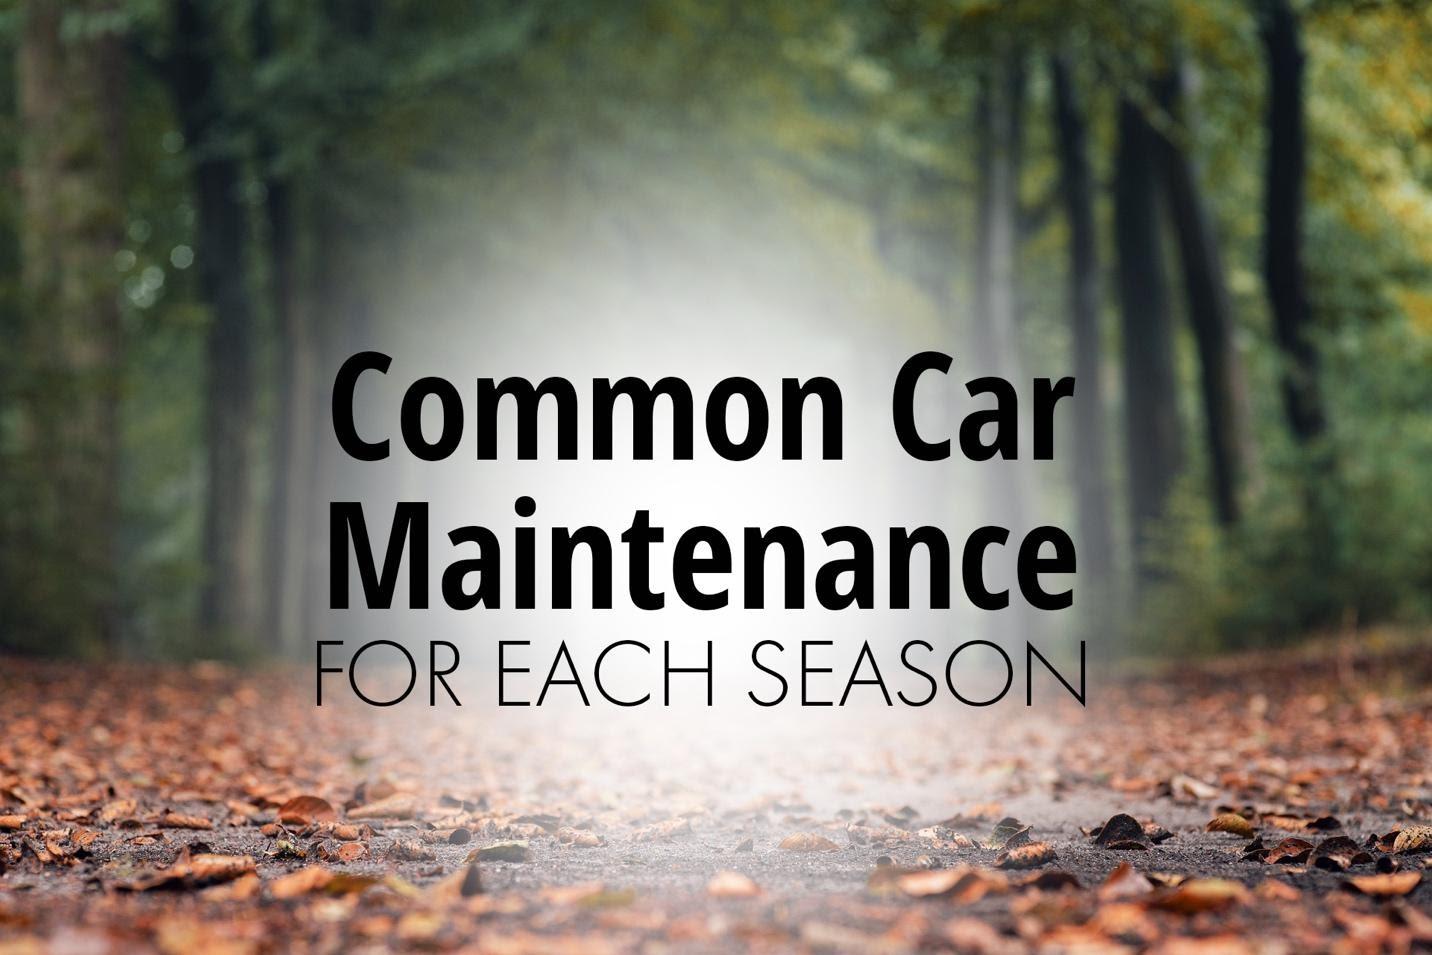 Common car maintenance for each season